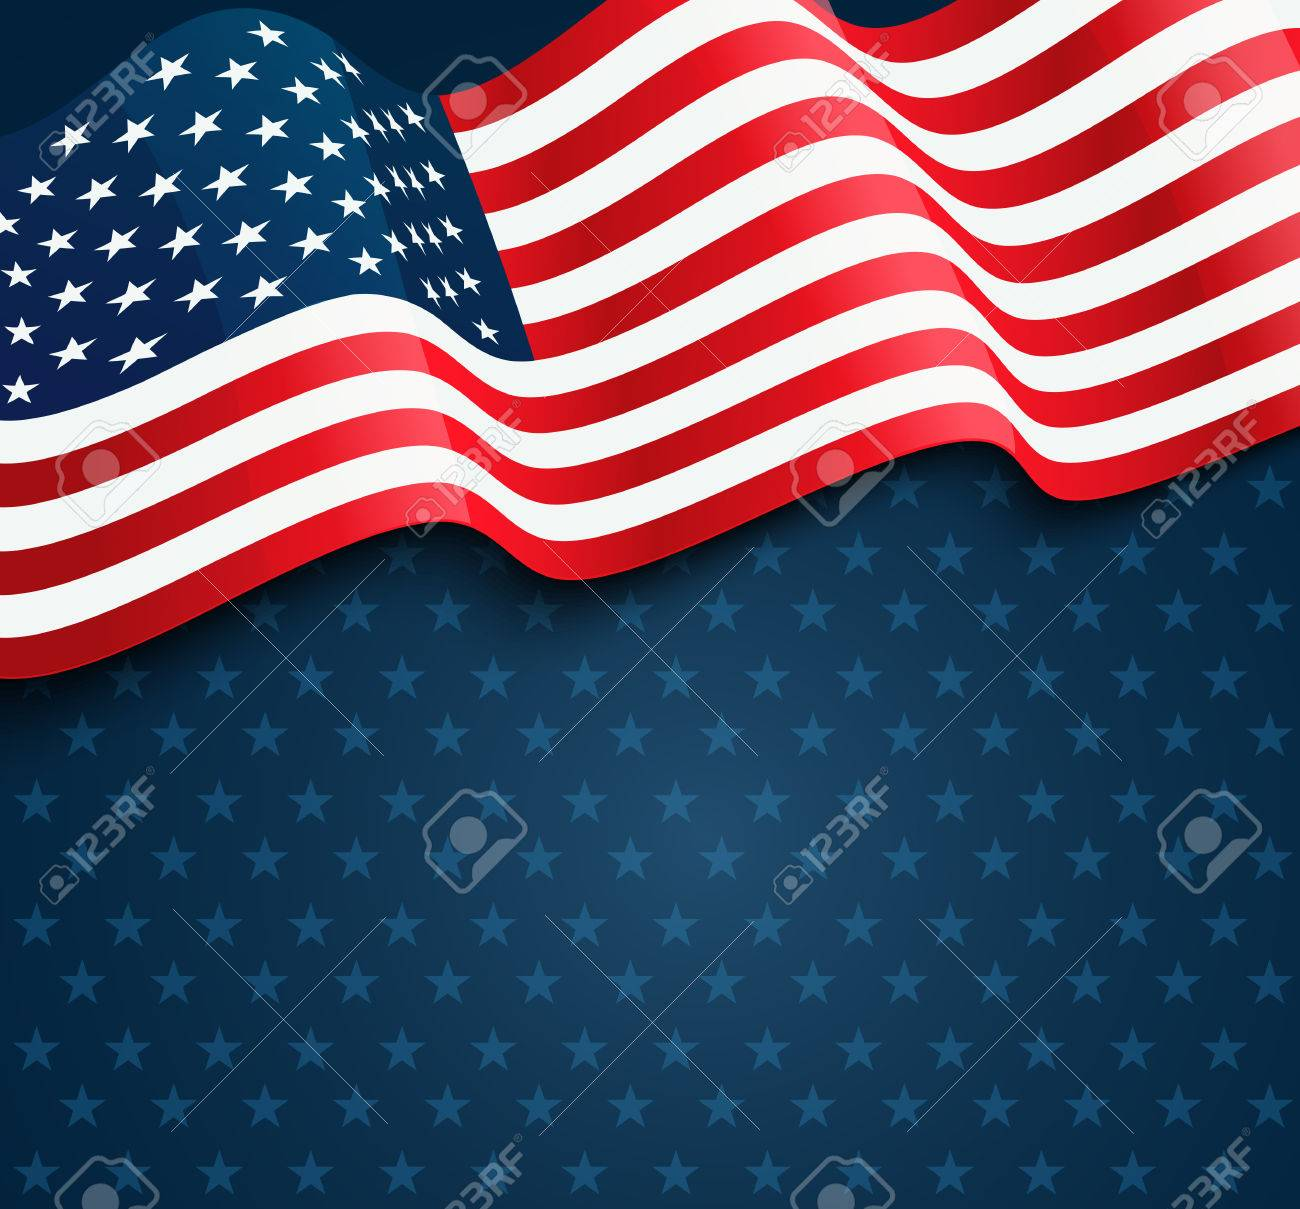 United States flag. USA Independence Day background. Fourth of July celebrate - 54493450